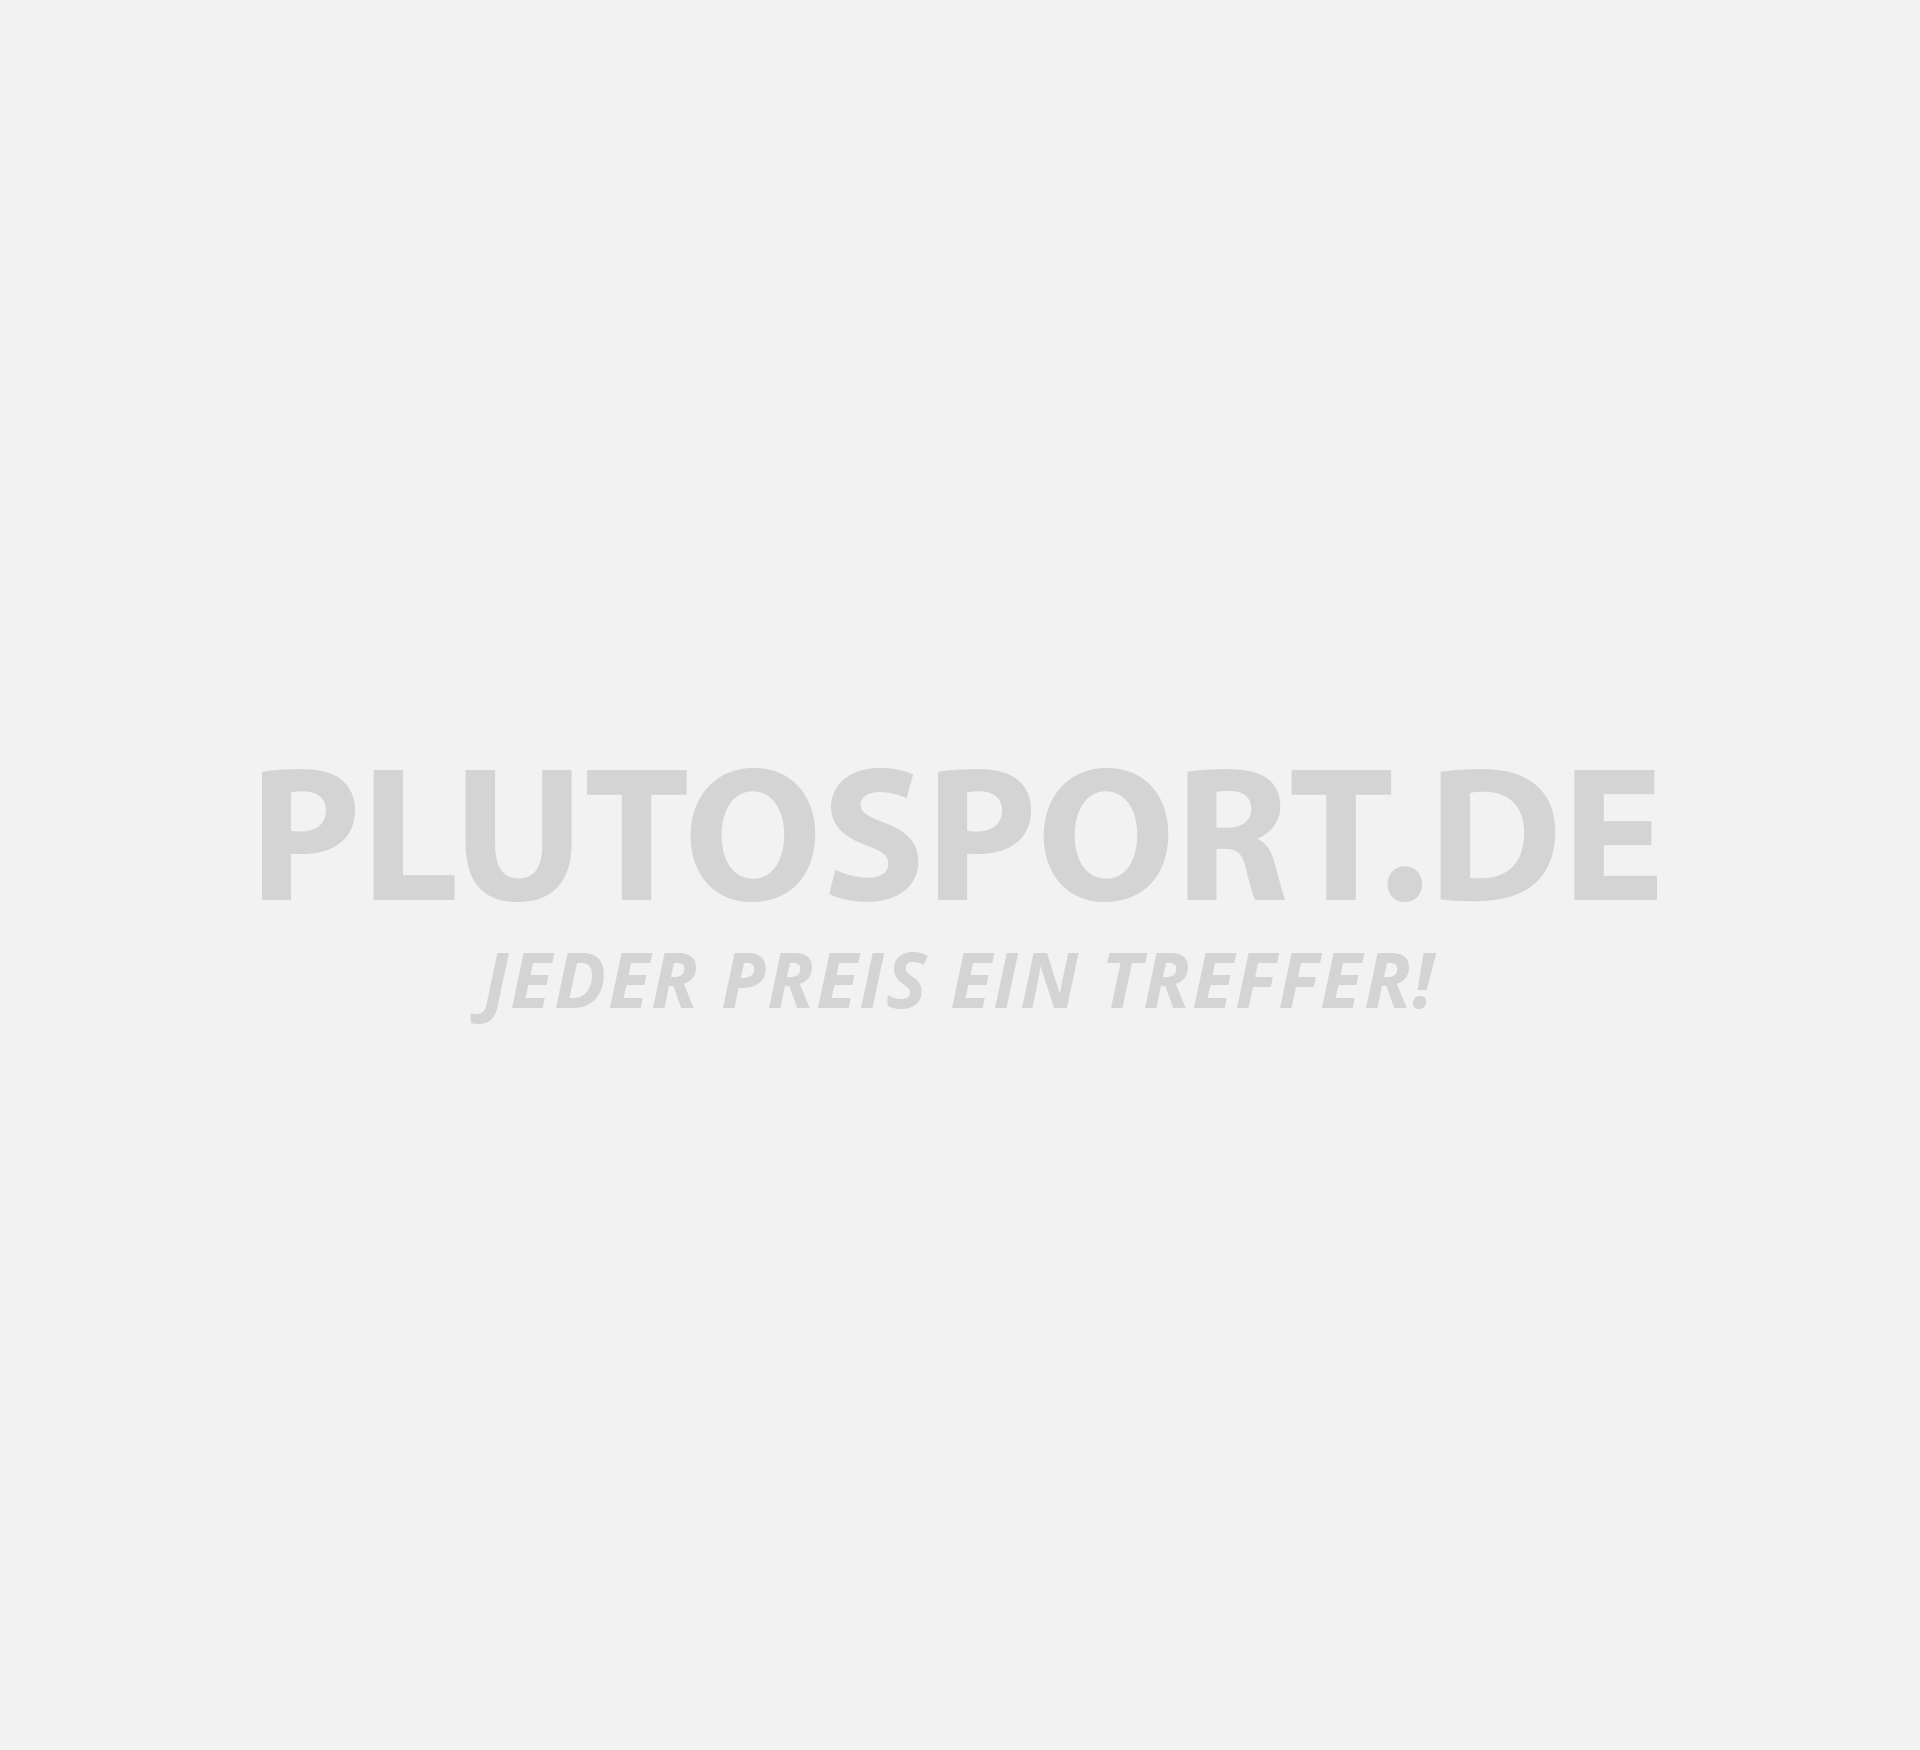 Freizeit Casual Adidas 10k Sportarten Schuhe Sneakers TKcF5l3u1J